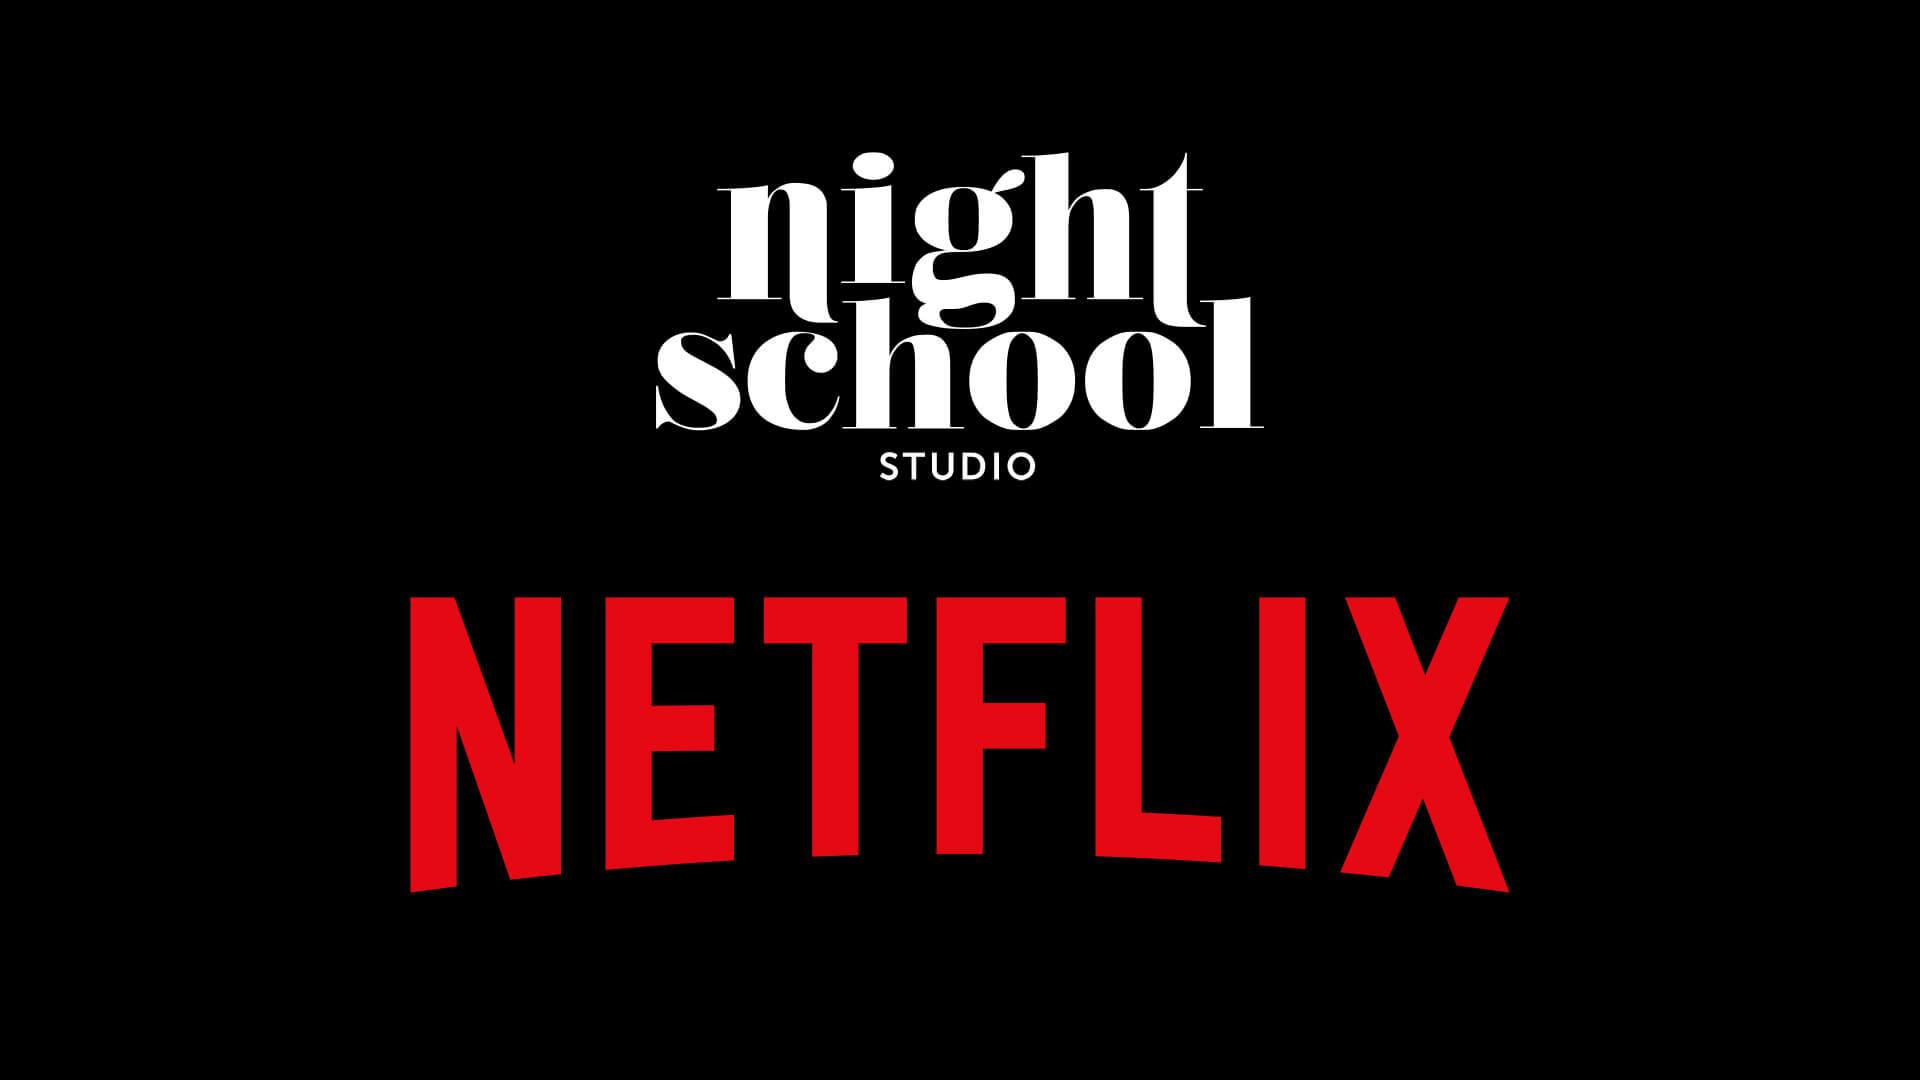 night-school-studio-netflix